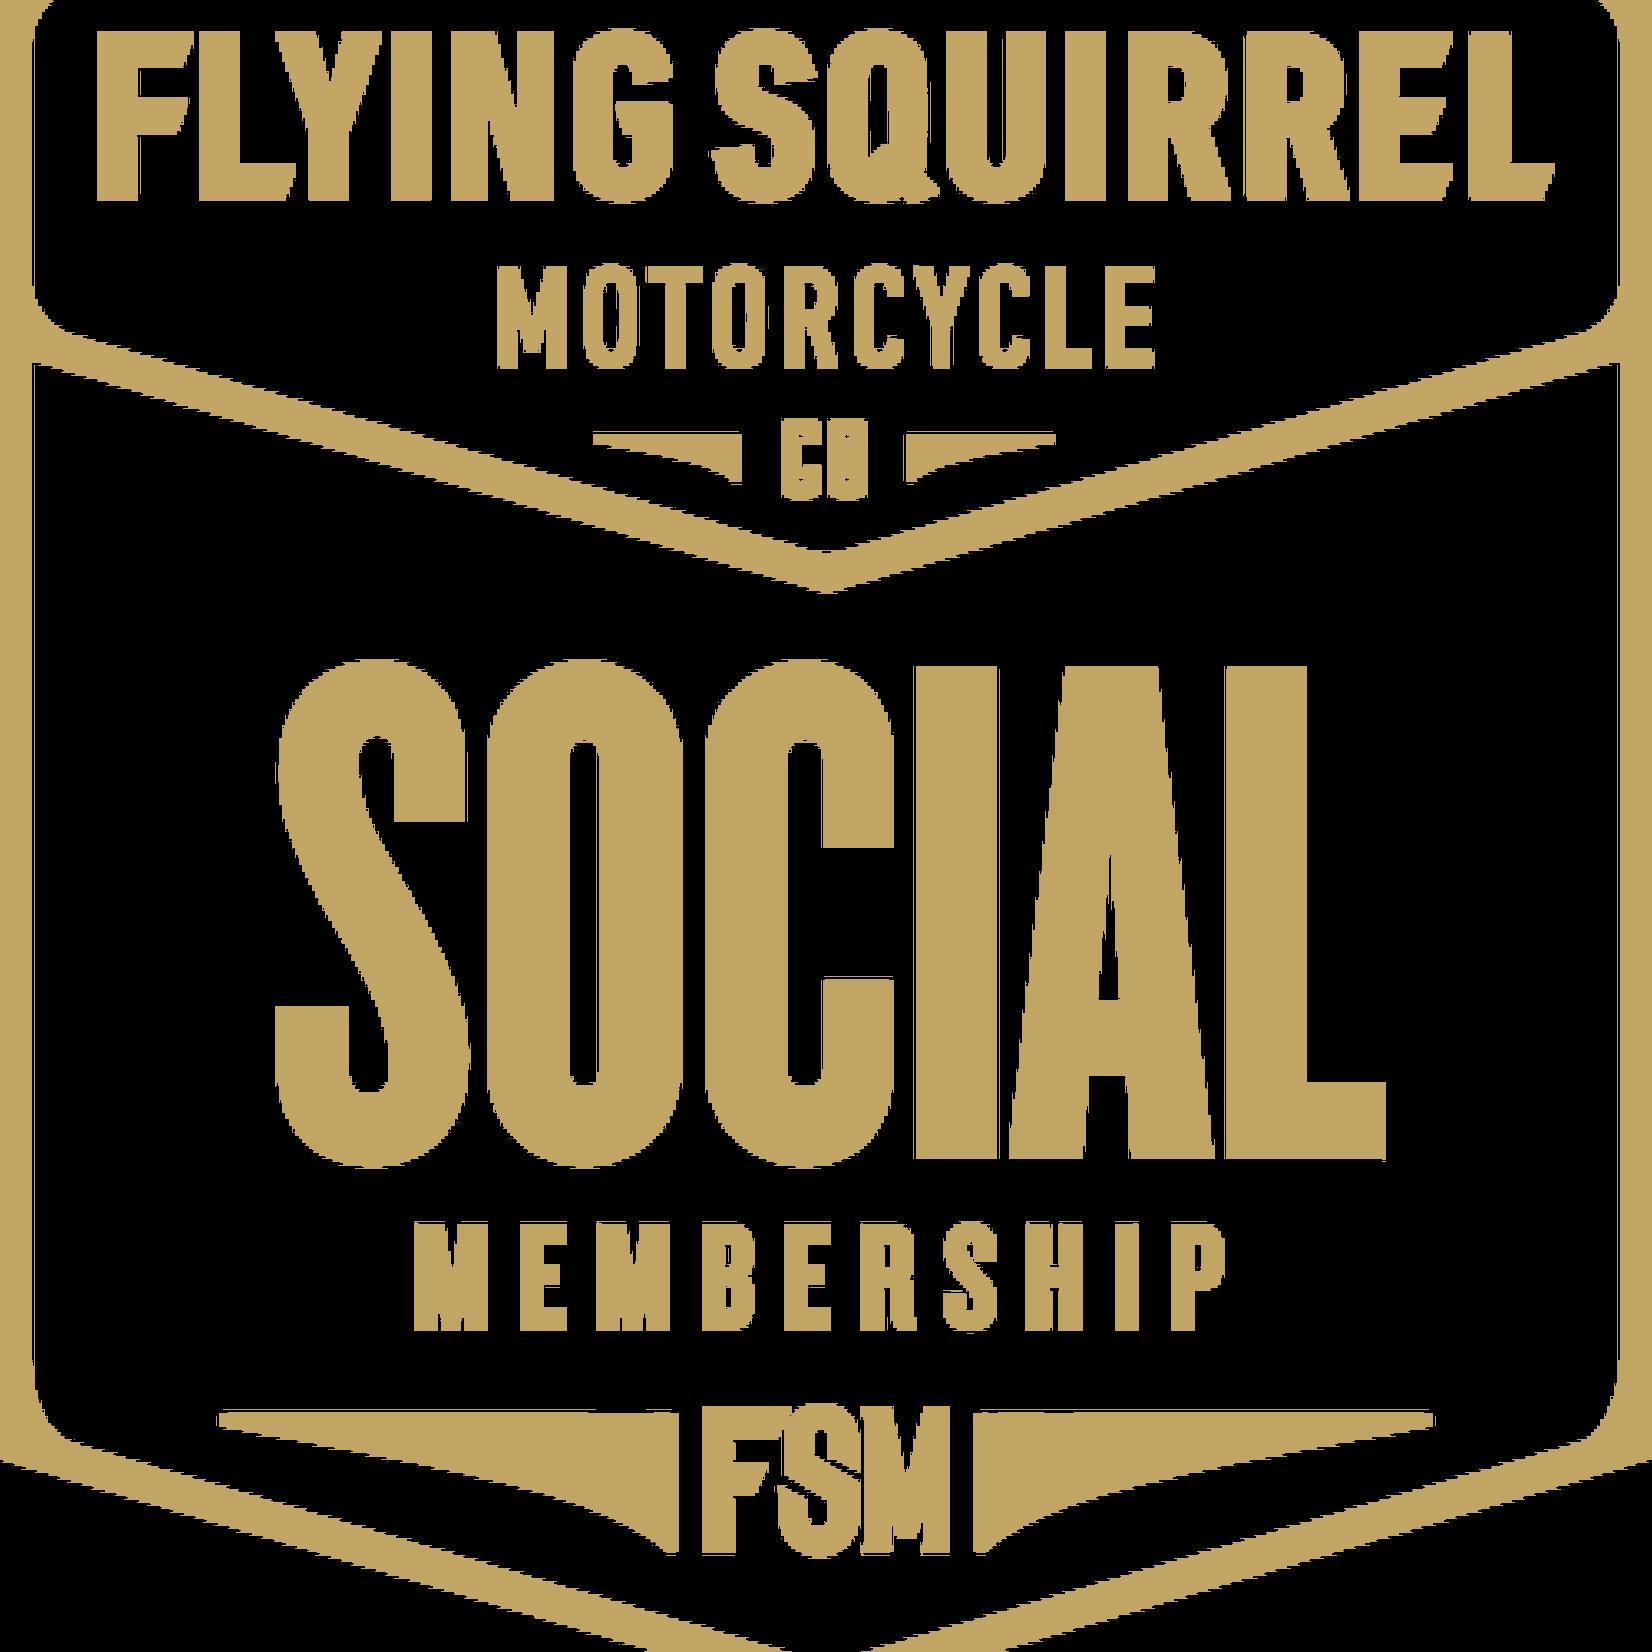 Membership - Moto Social